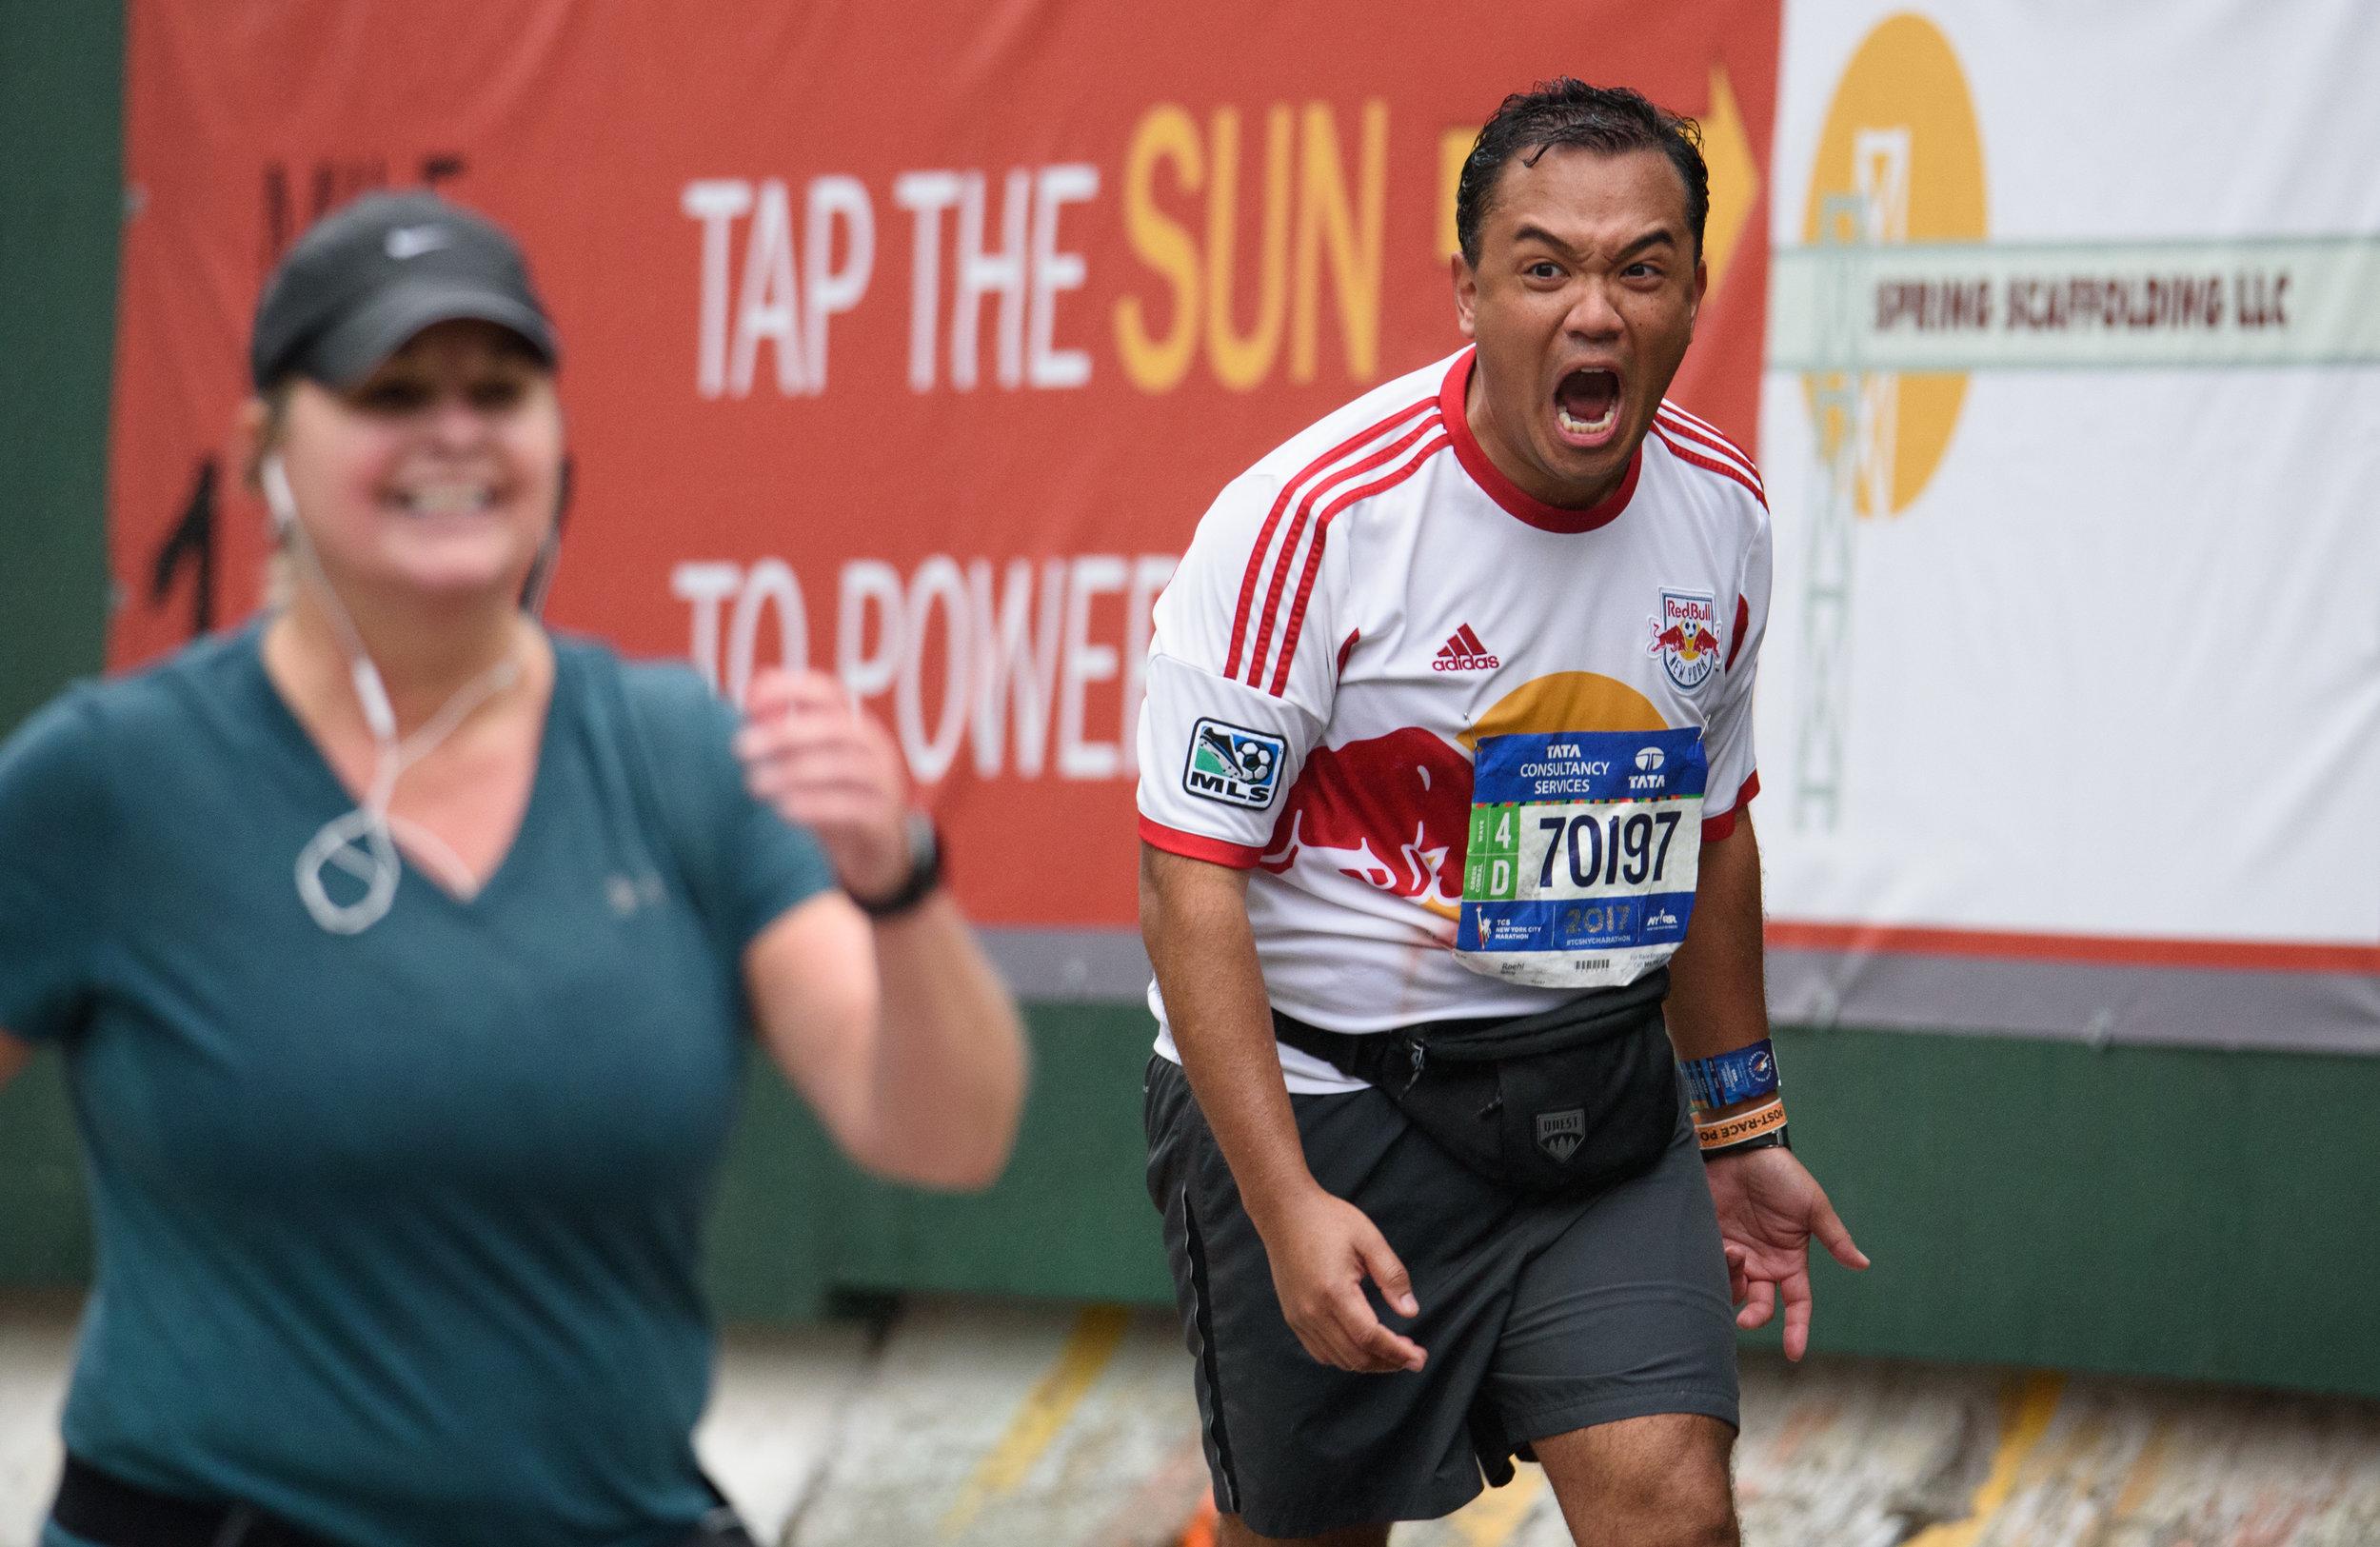 Marathon excitement [November 5]